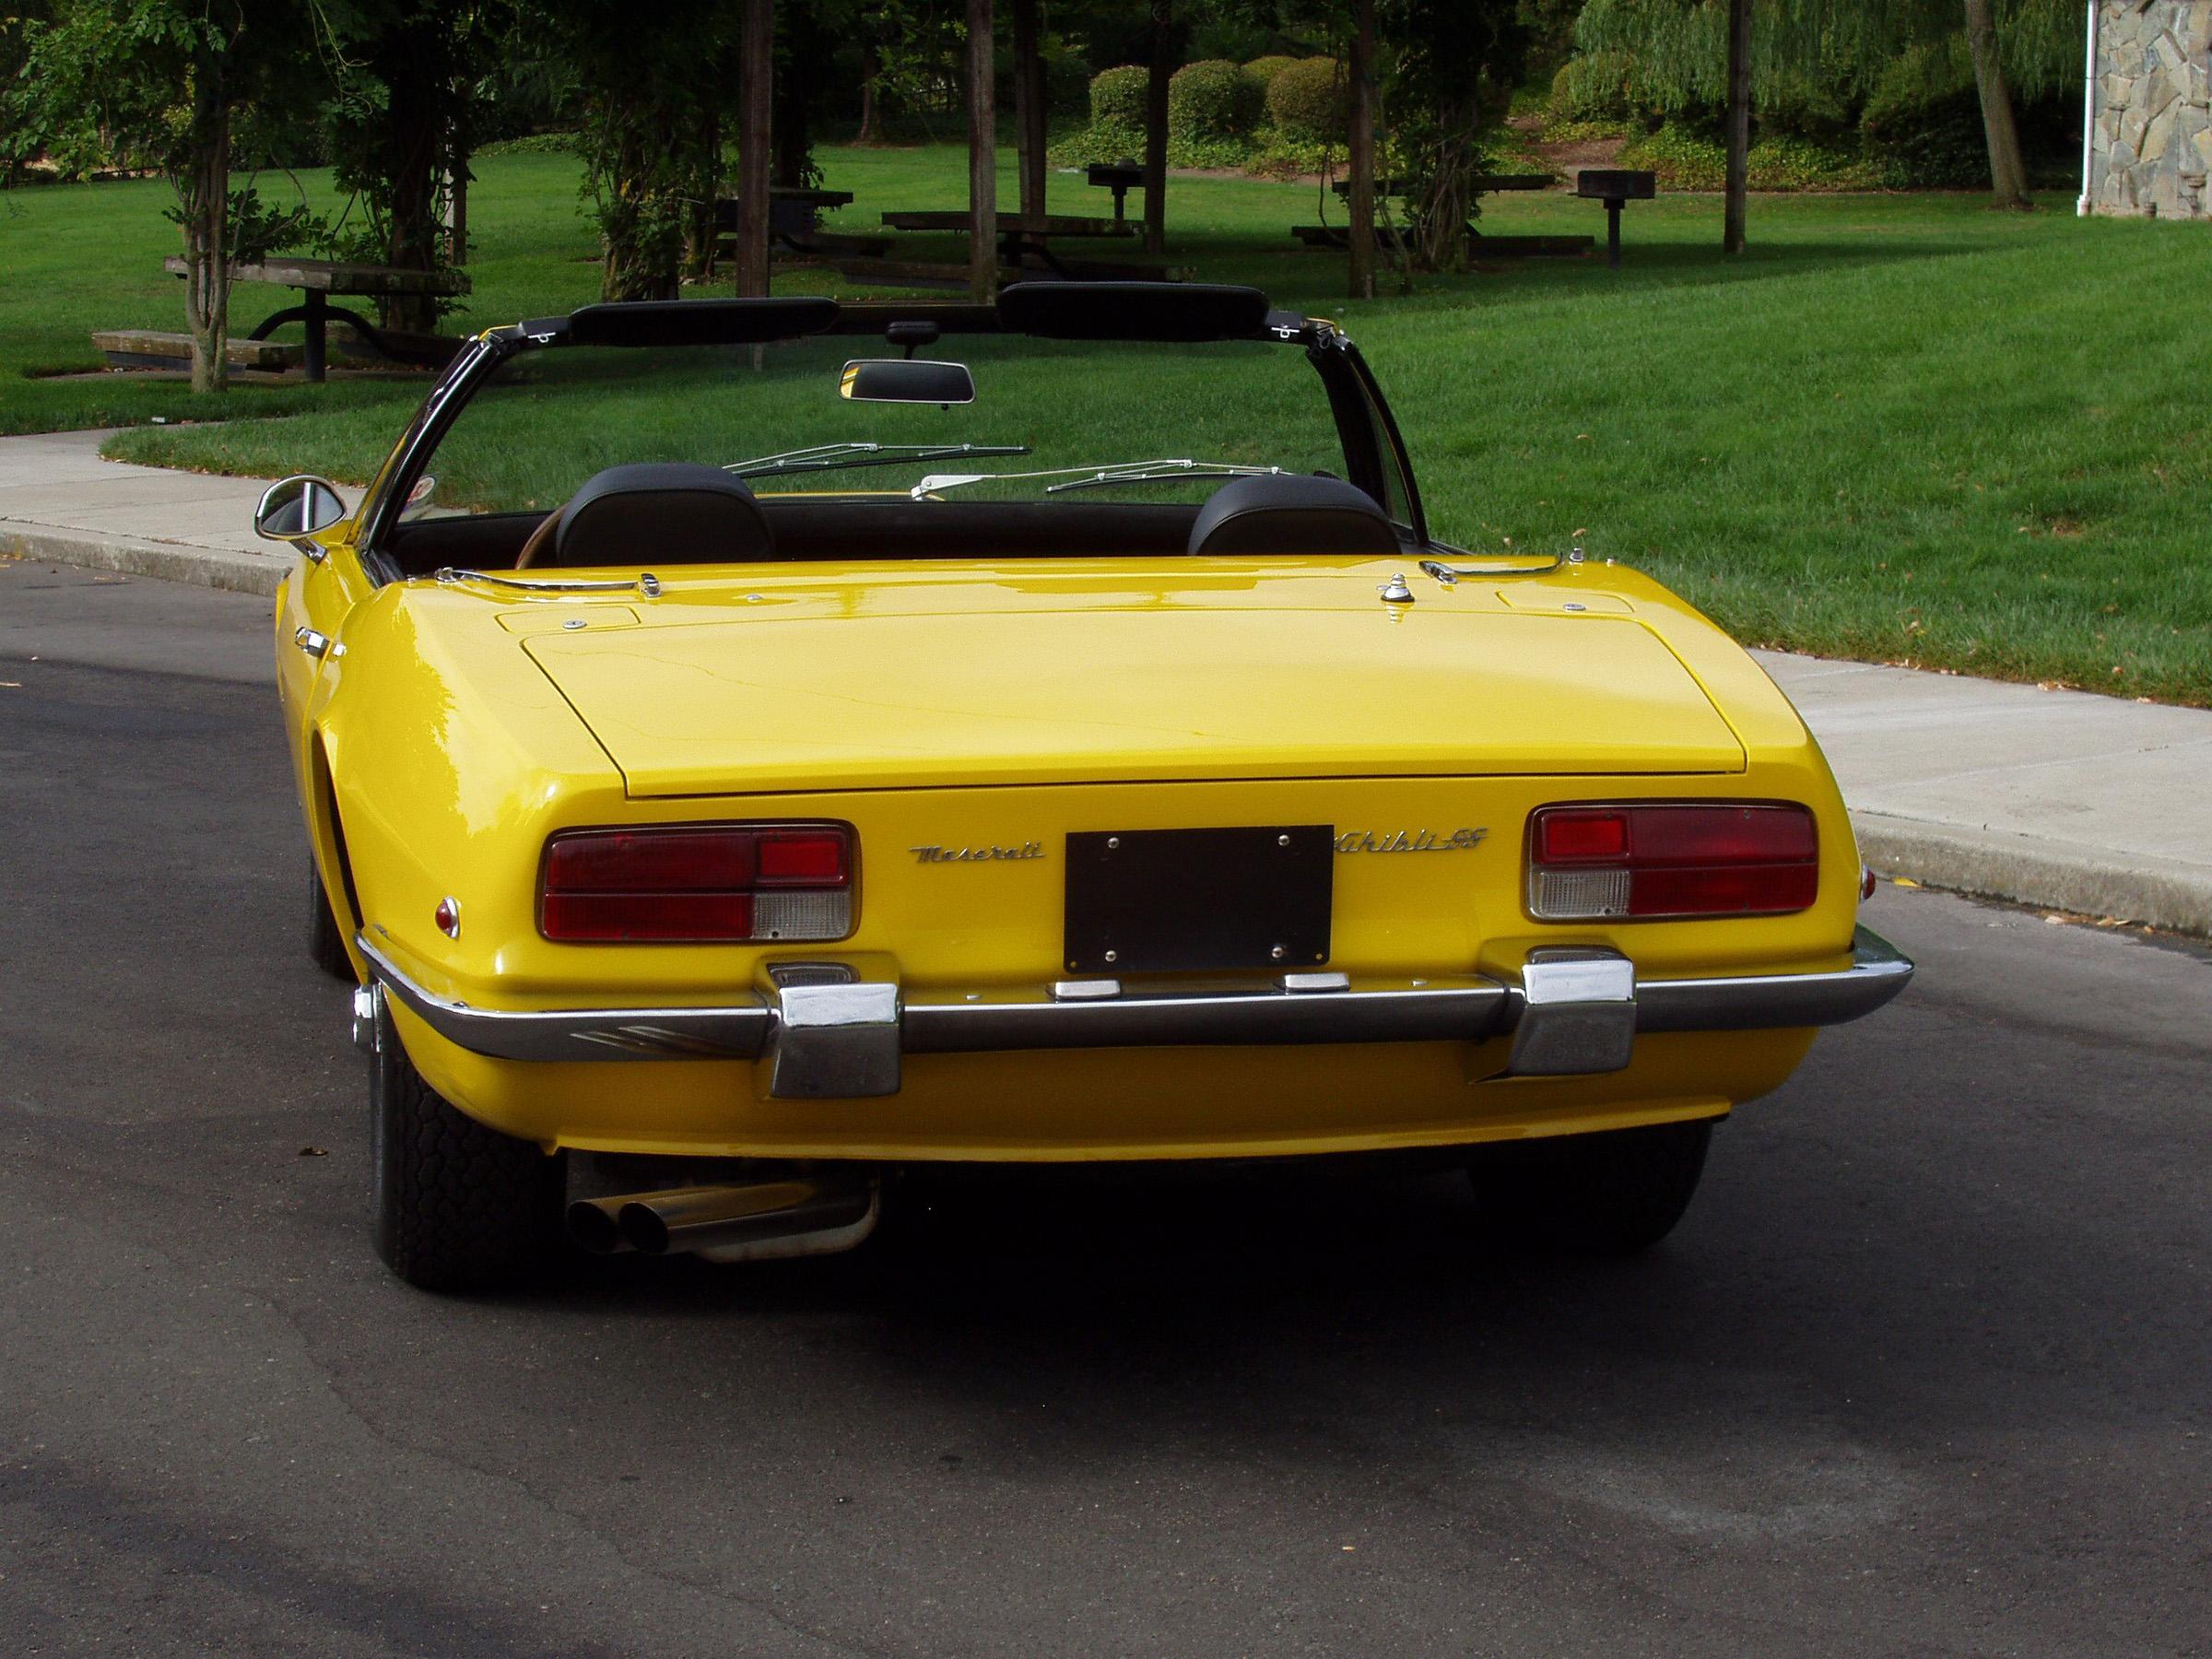 1971 Maserati Ghibli SS 4.9 Spyder   Blackhawk Collection